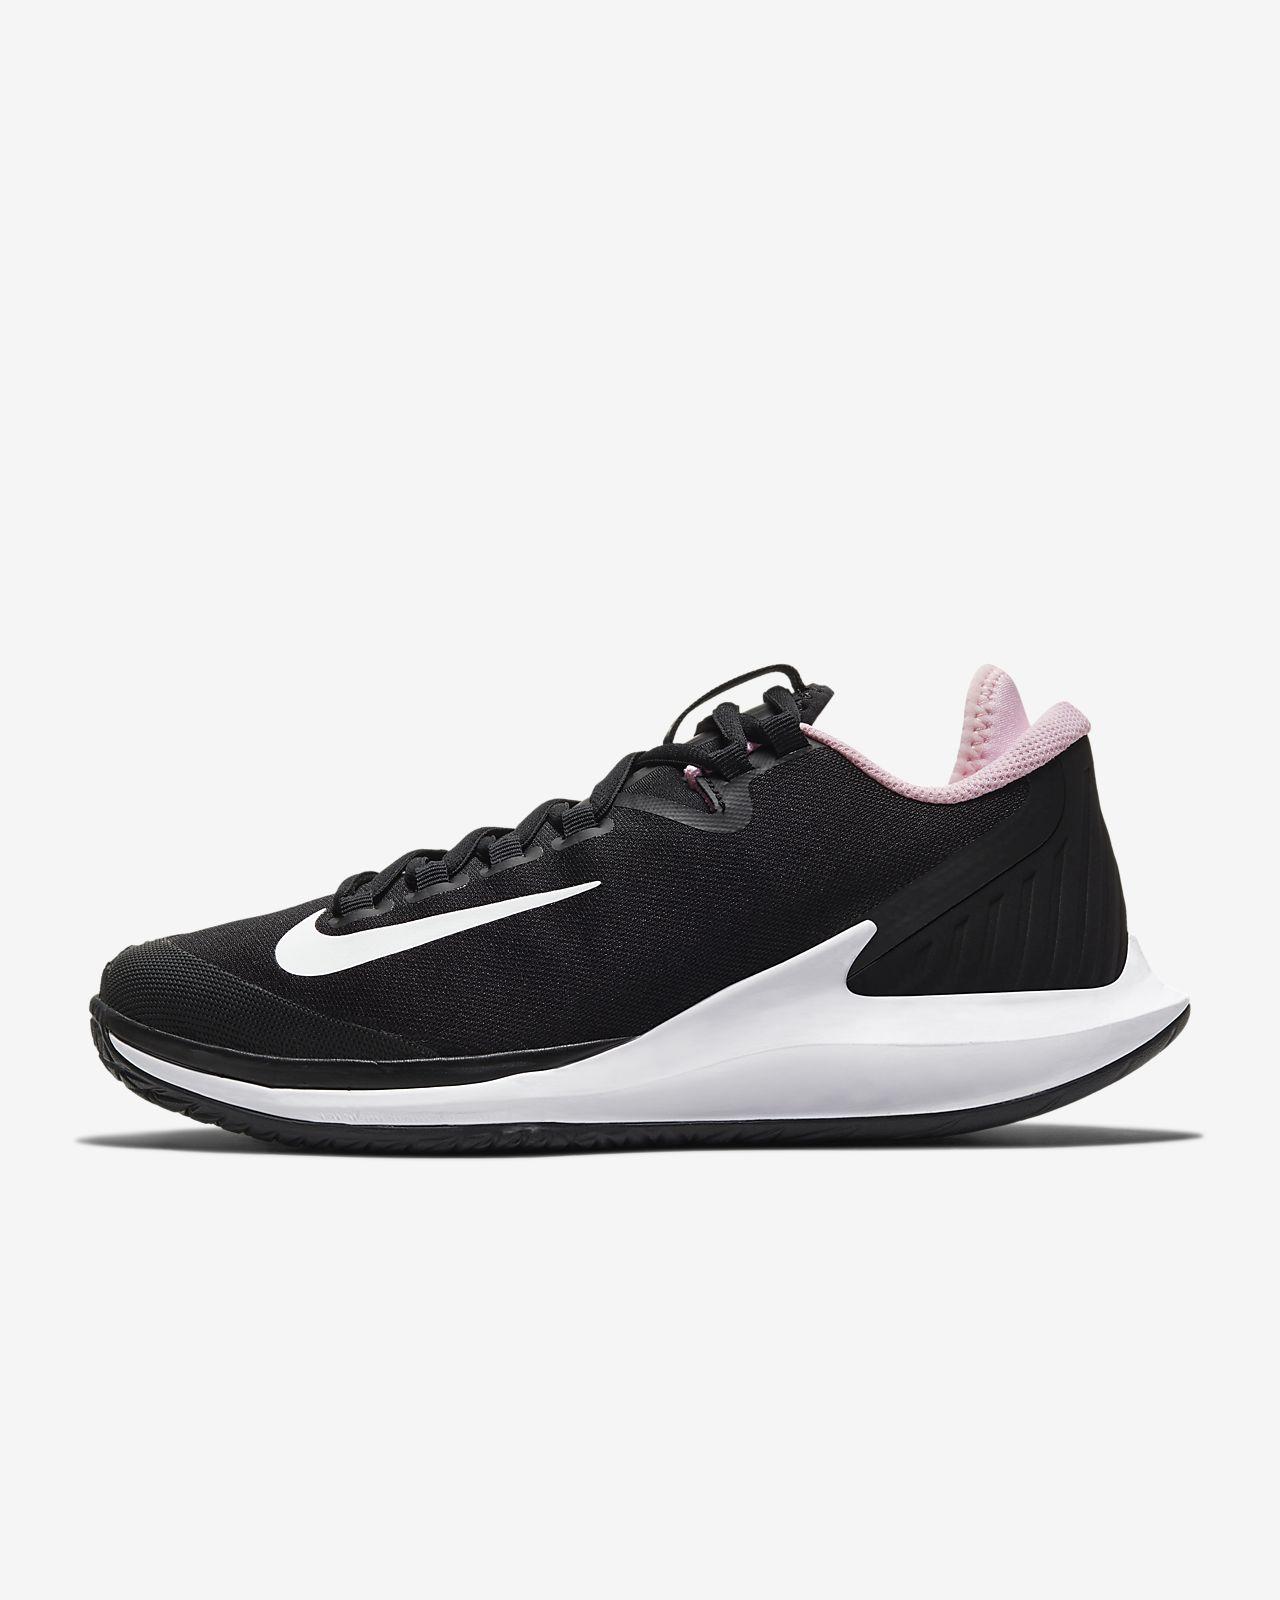 Nike Tennis Shoes Air Zoom Zero All Court Shoe Women Black, Multicoloured